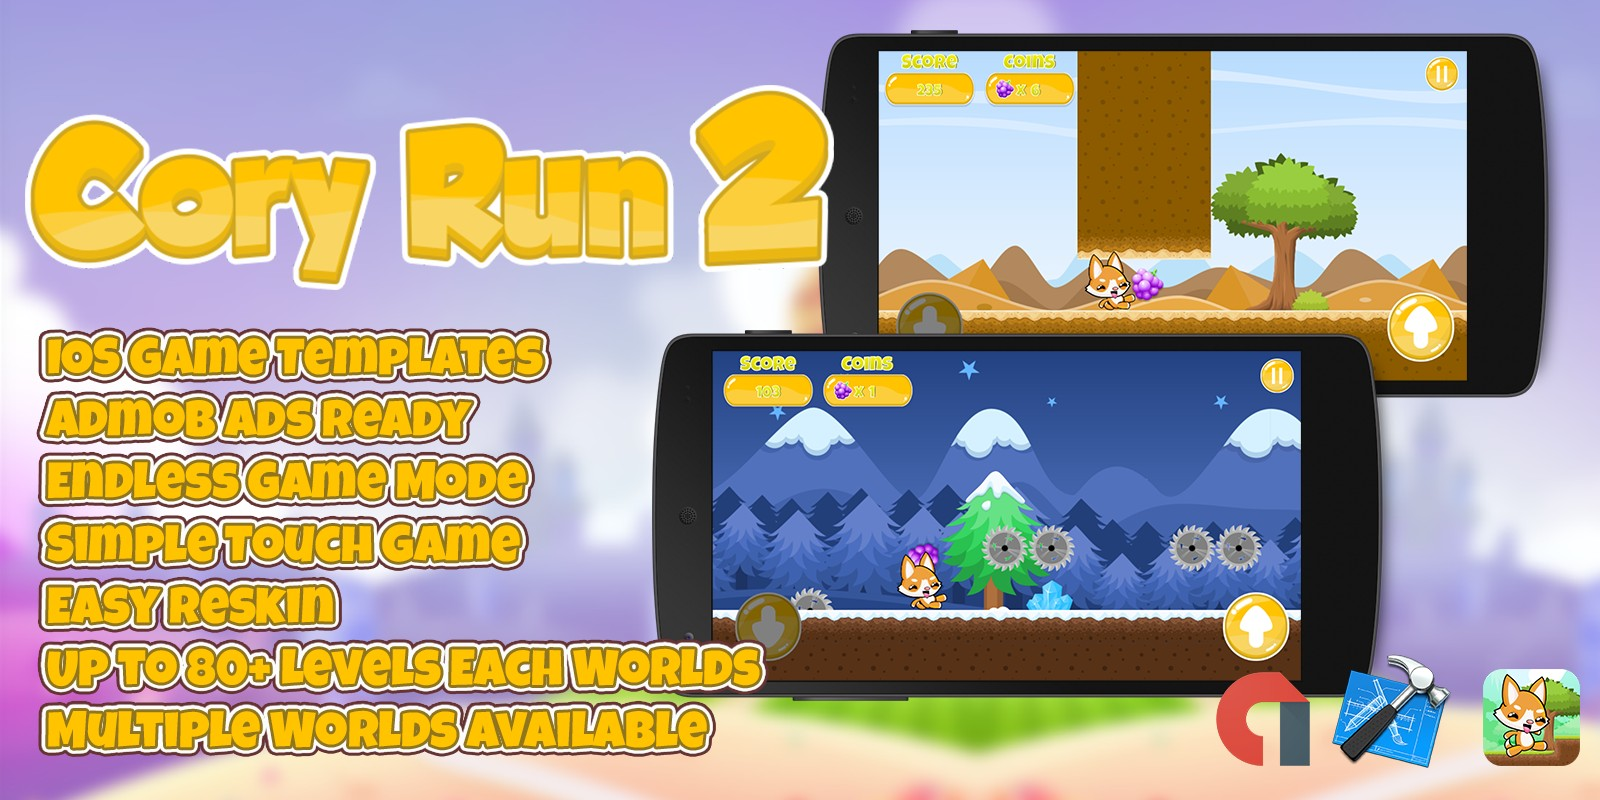 Cory Run 2 - iOS Xcode Source Code